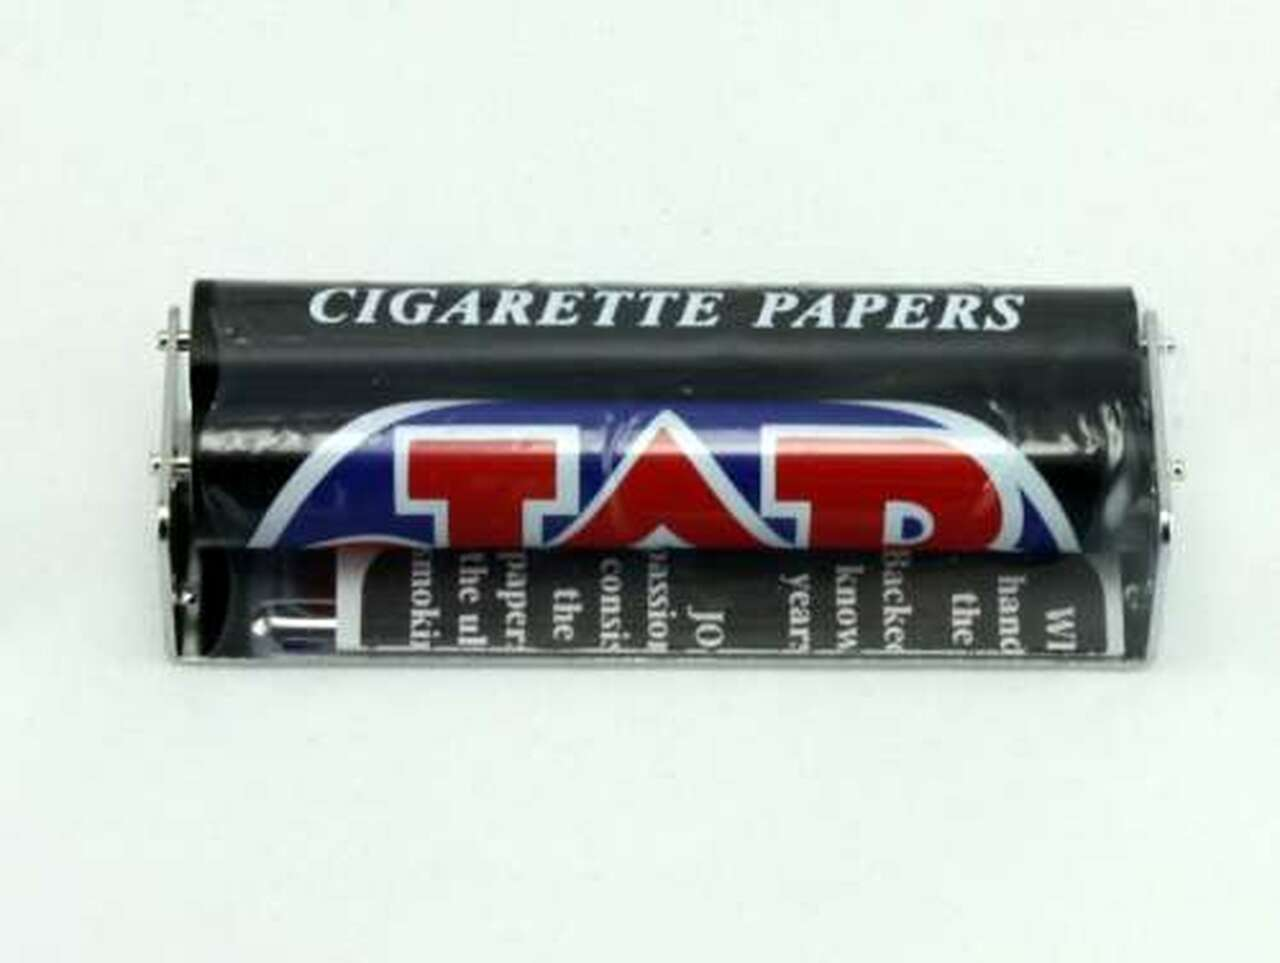 JOB 79mm Steel Cigarette Roller